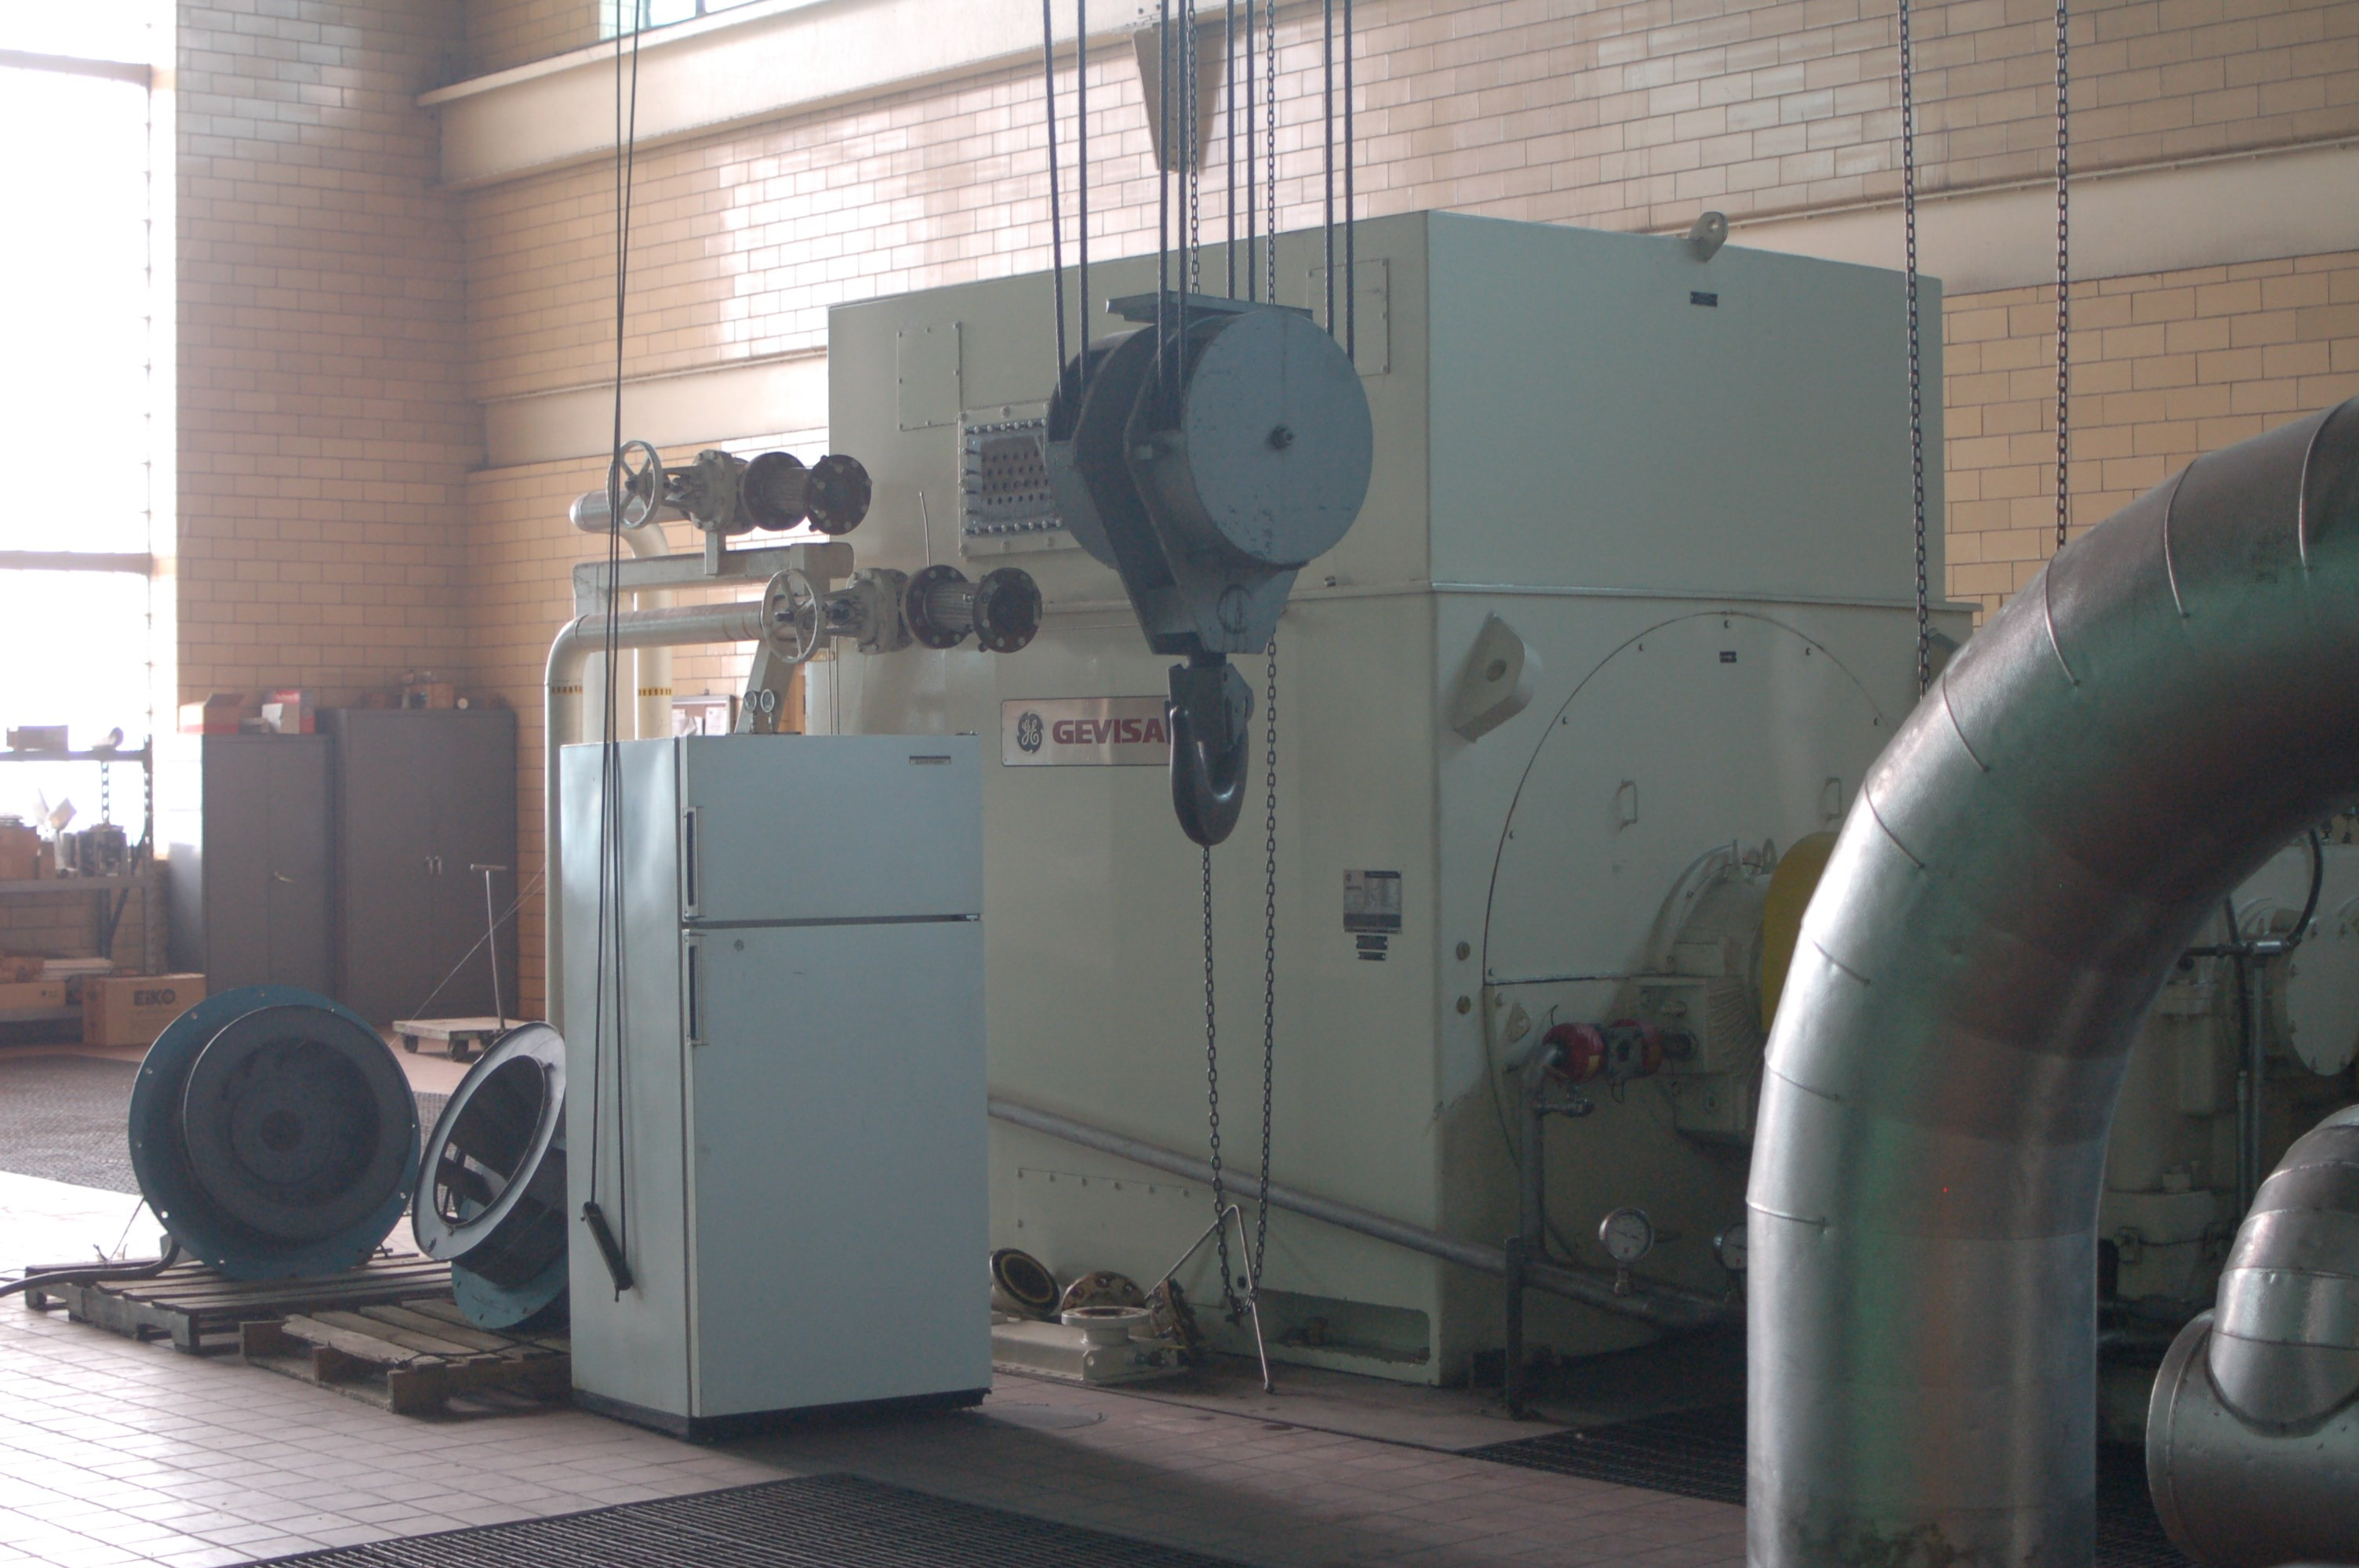 7 MW Dresser Rand Steam Turbine Generator  12120  New Used and Surplus Equipment  Phoenix